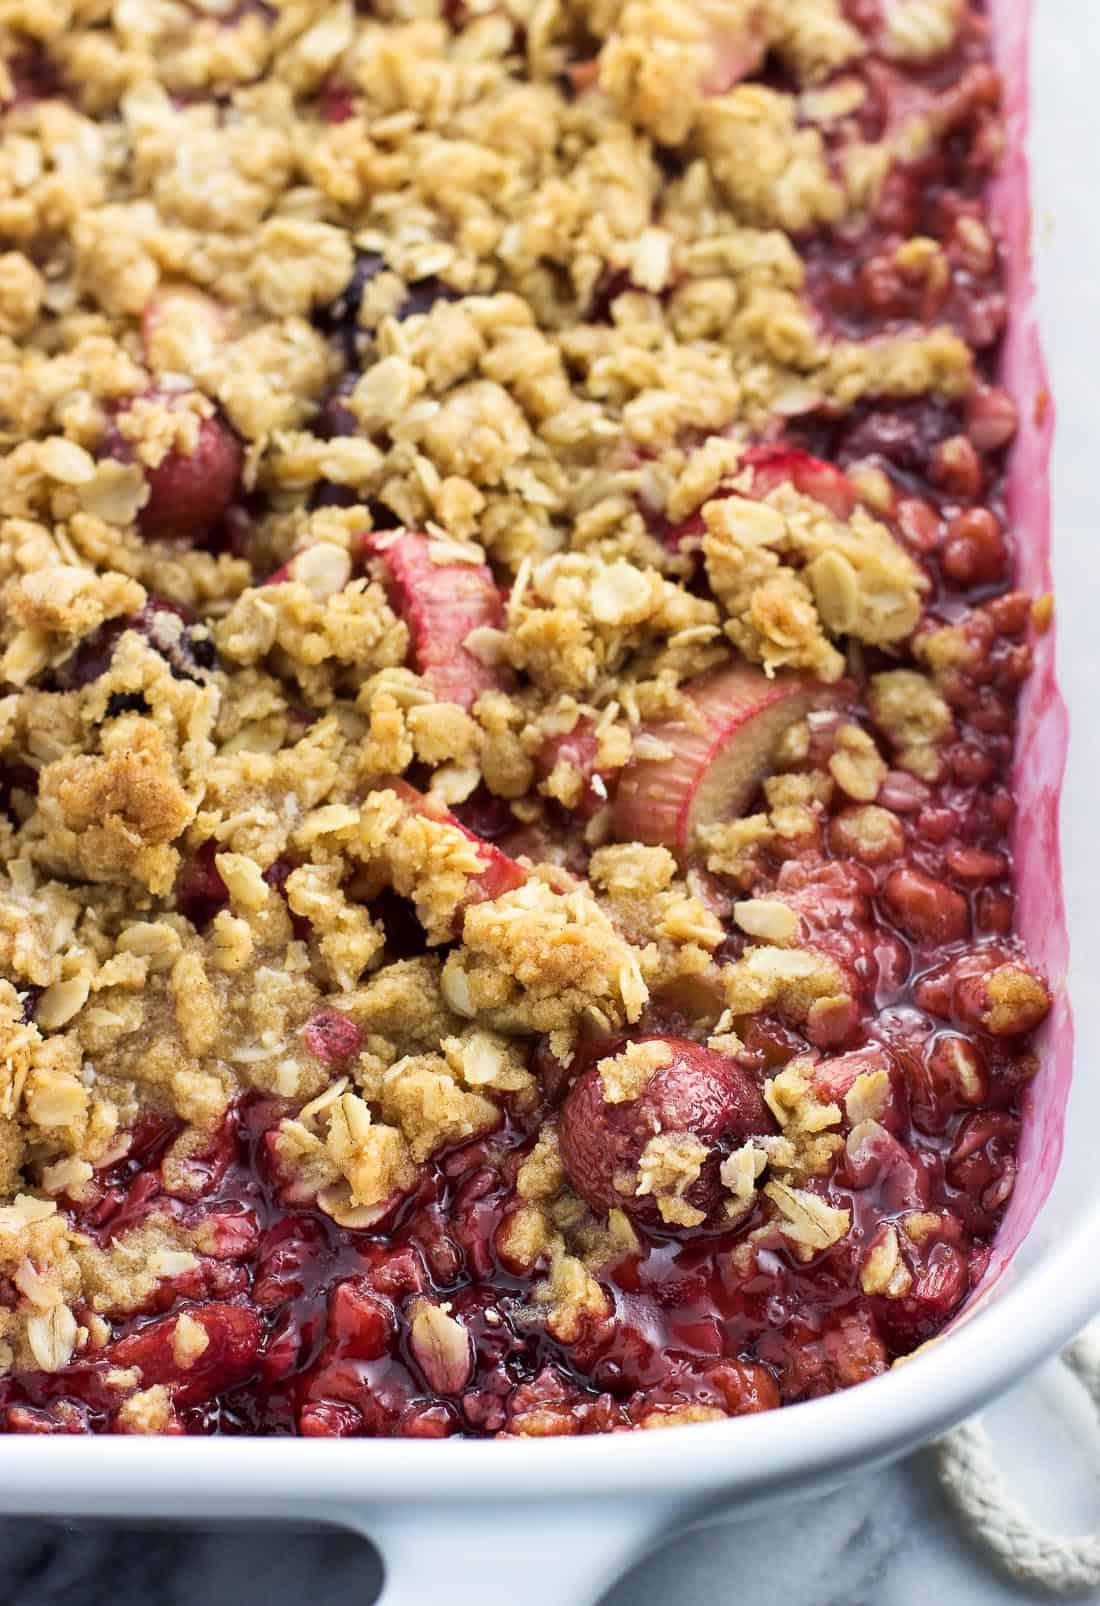 Baked cherry rhubarb crisp in a baking dish